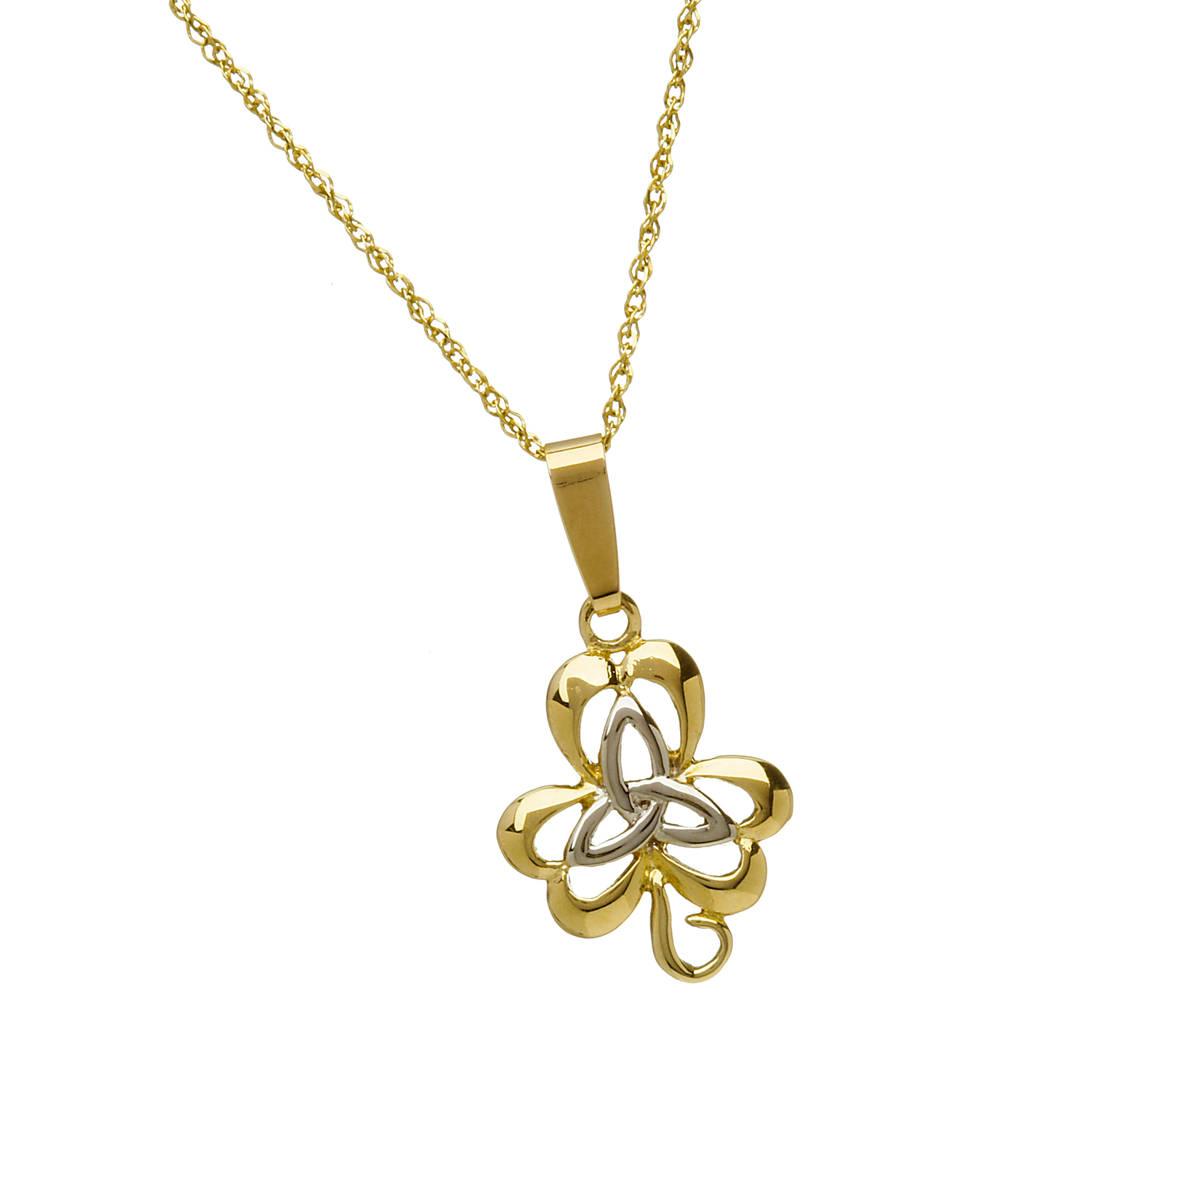 10 carat yellow gold/white gold trinity knot inside open shamrock combination pendant.